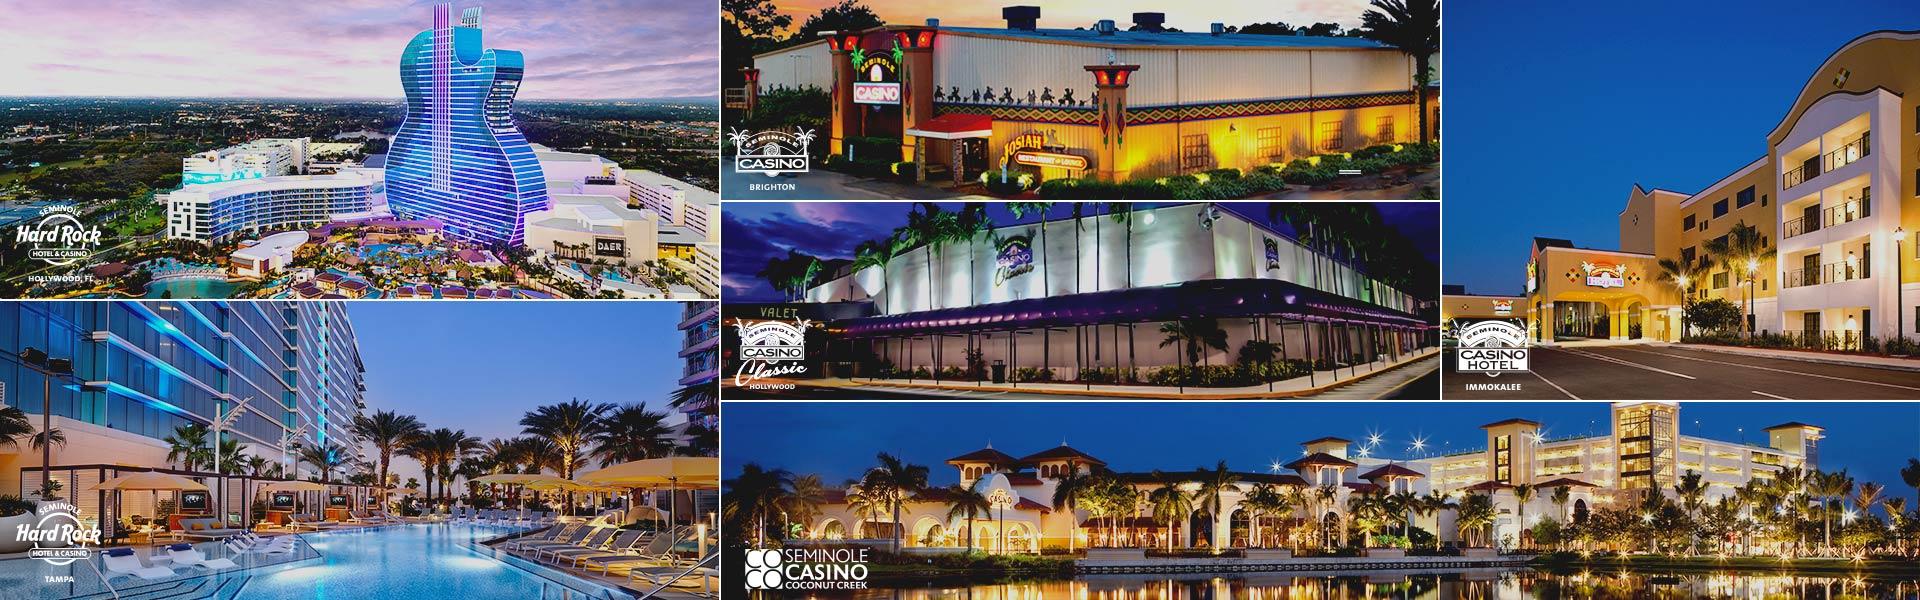 florida indian casinos locations